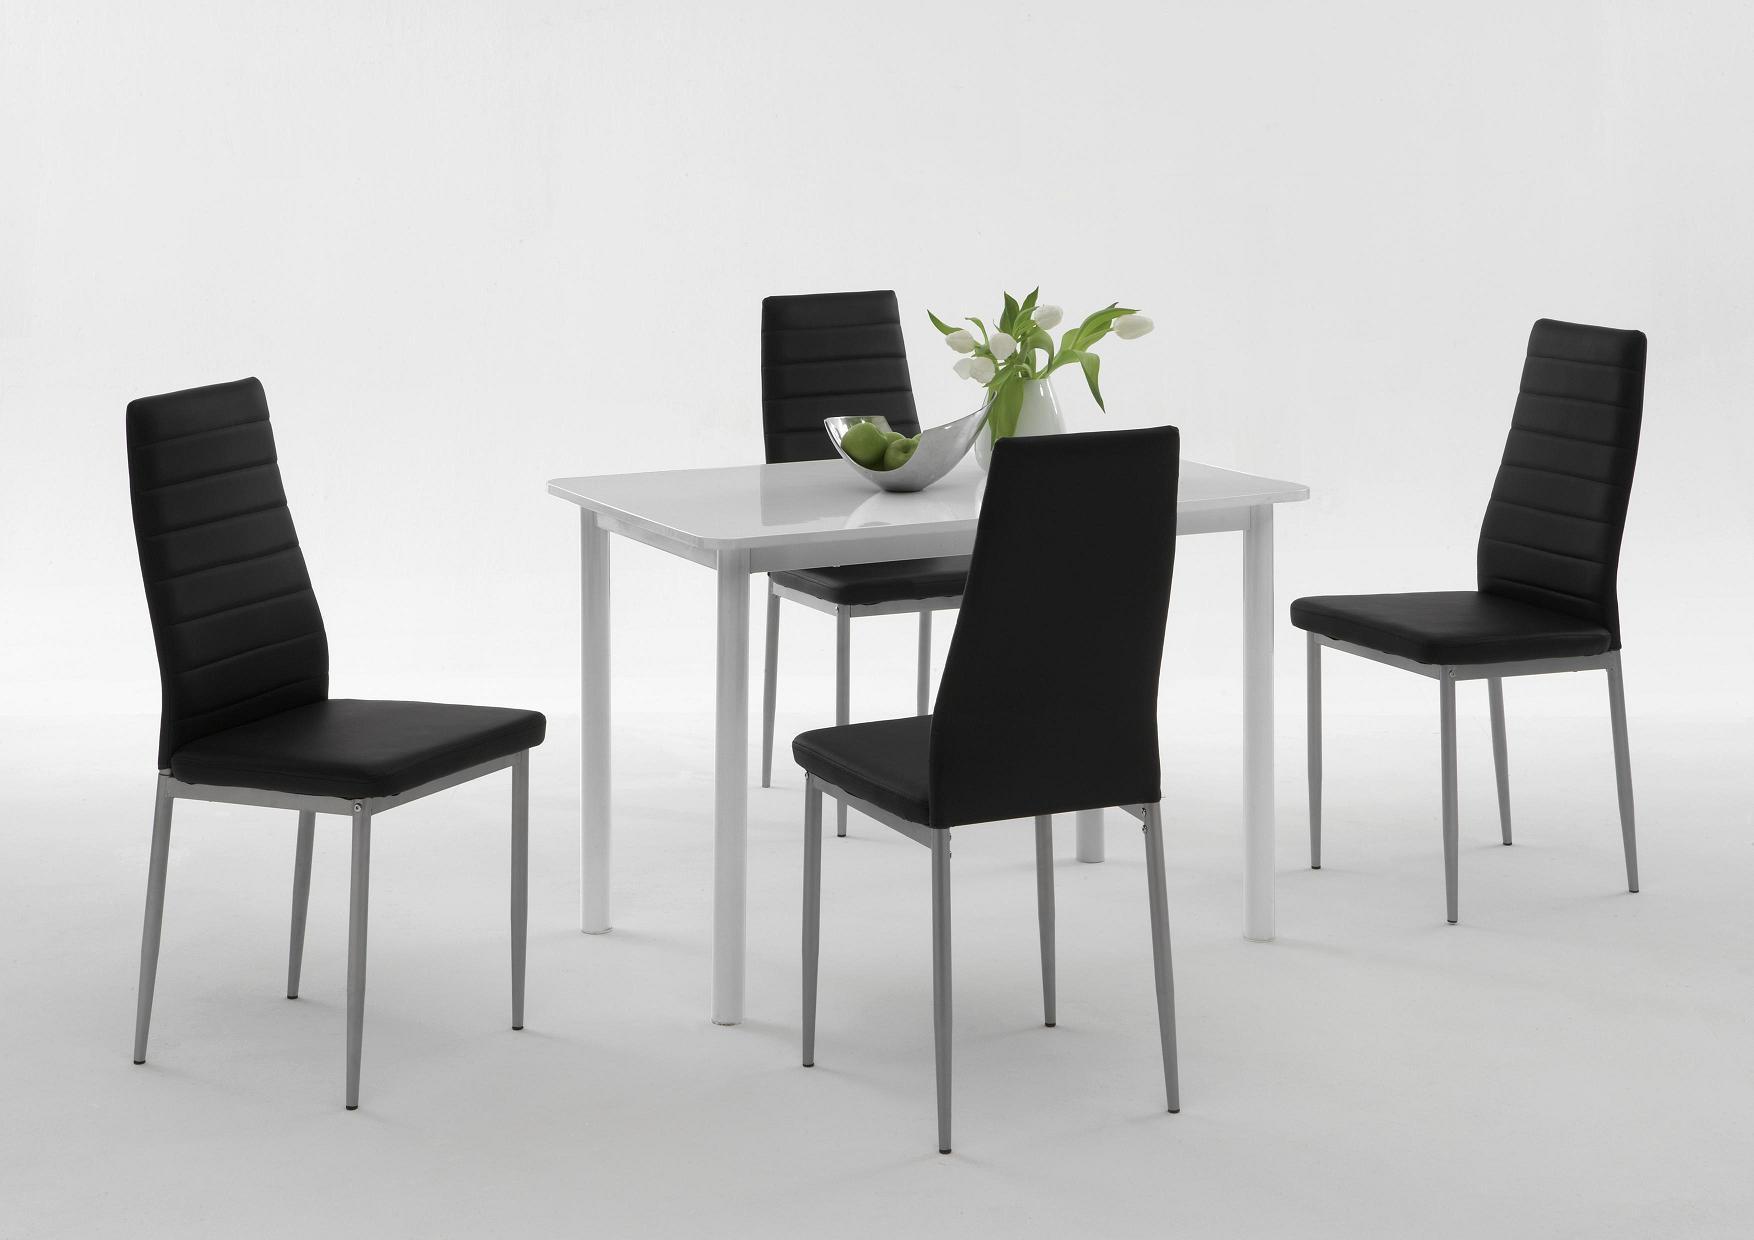 6 Stühle=Set Vierfussstuhl Stuhl Simone S 03 Kunstleder Schwarz